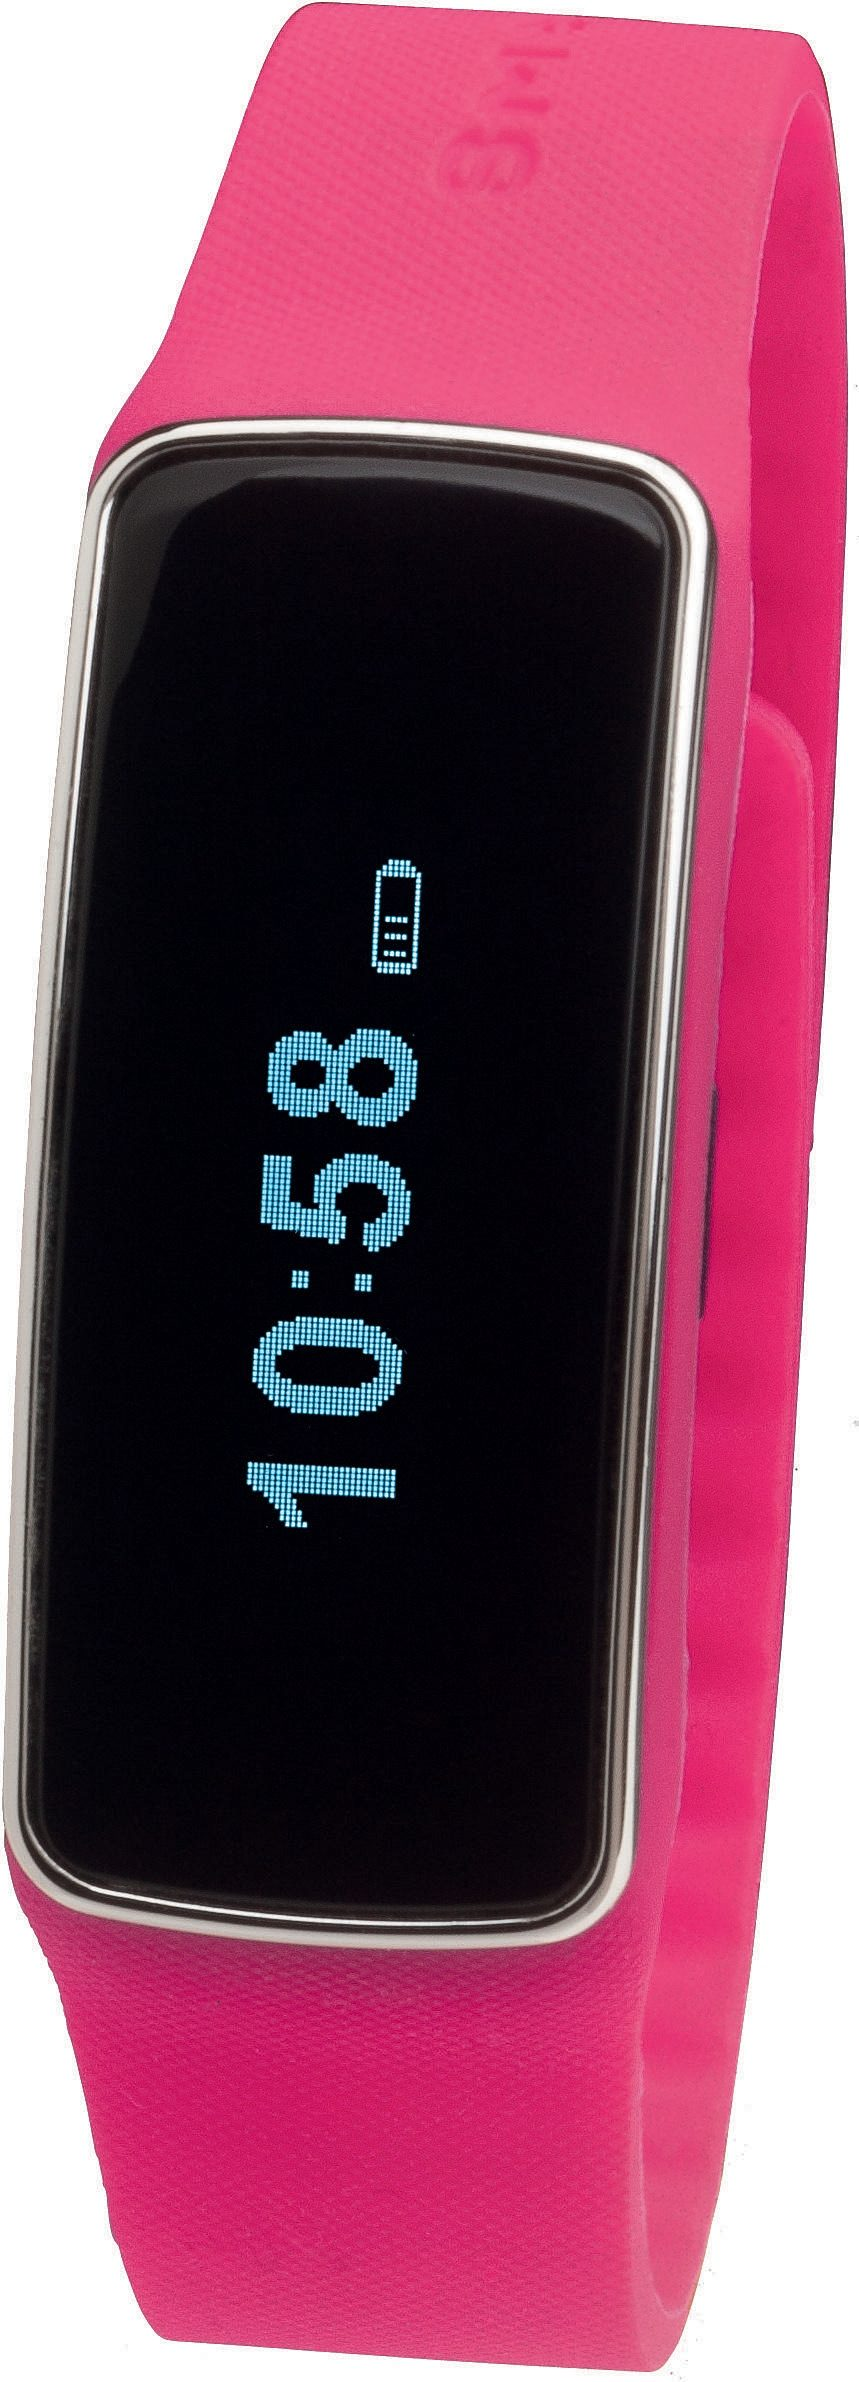 Blox BX15103 Smartwatch